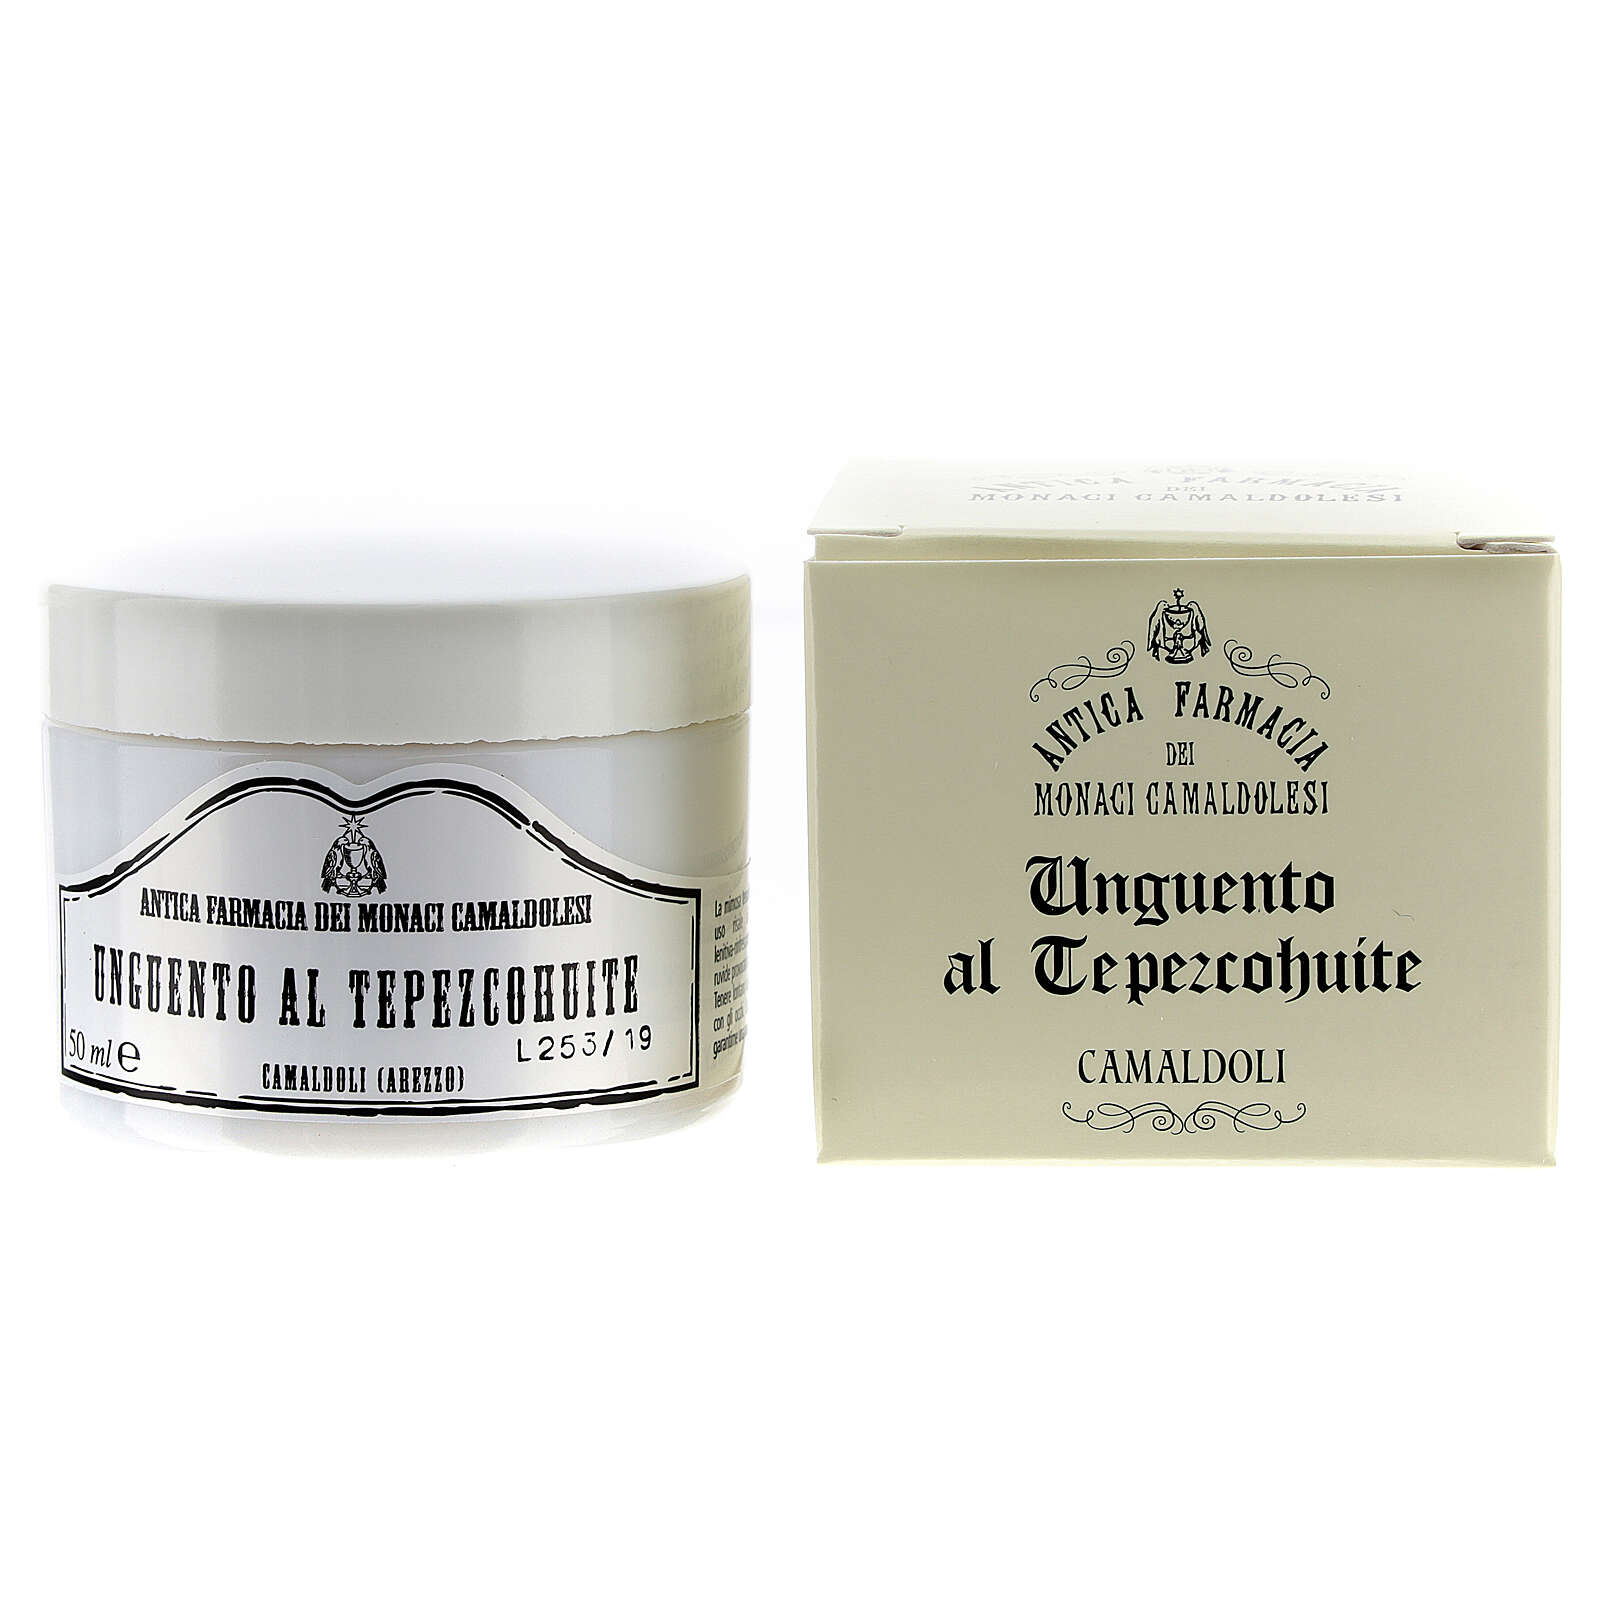 Camaldoli Tepezcohuite Balsam (50 ml) 4